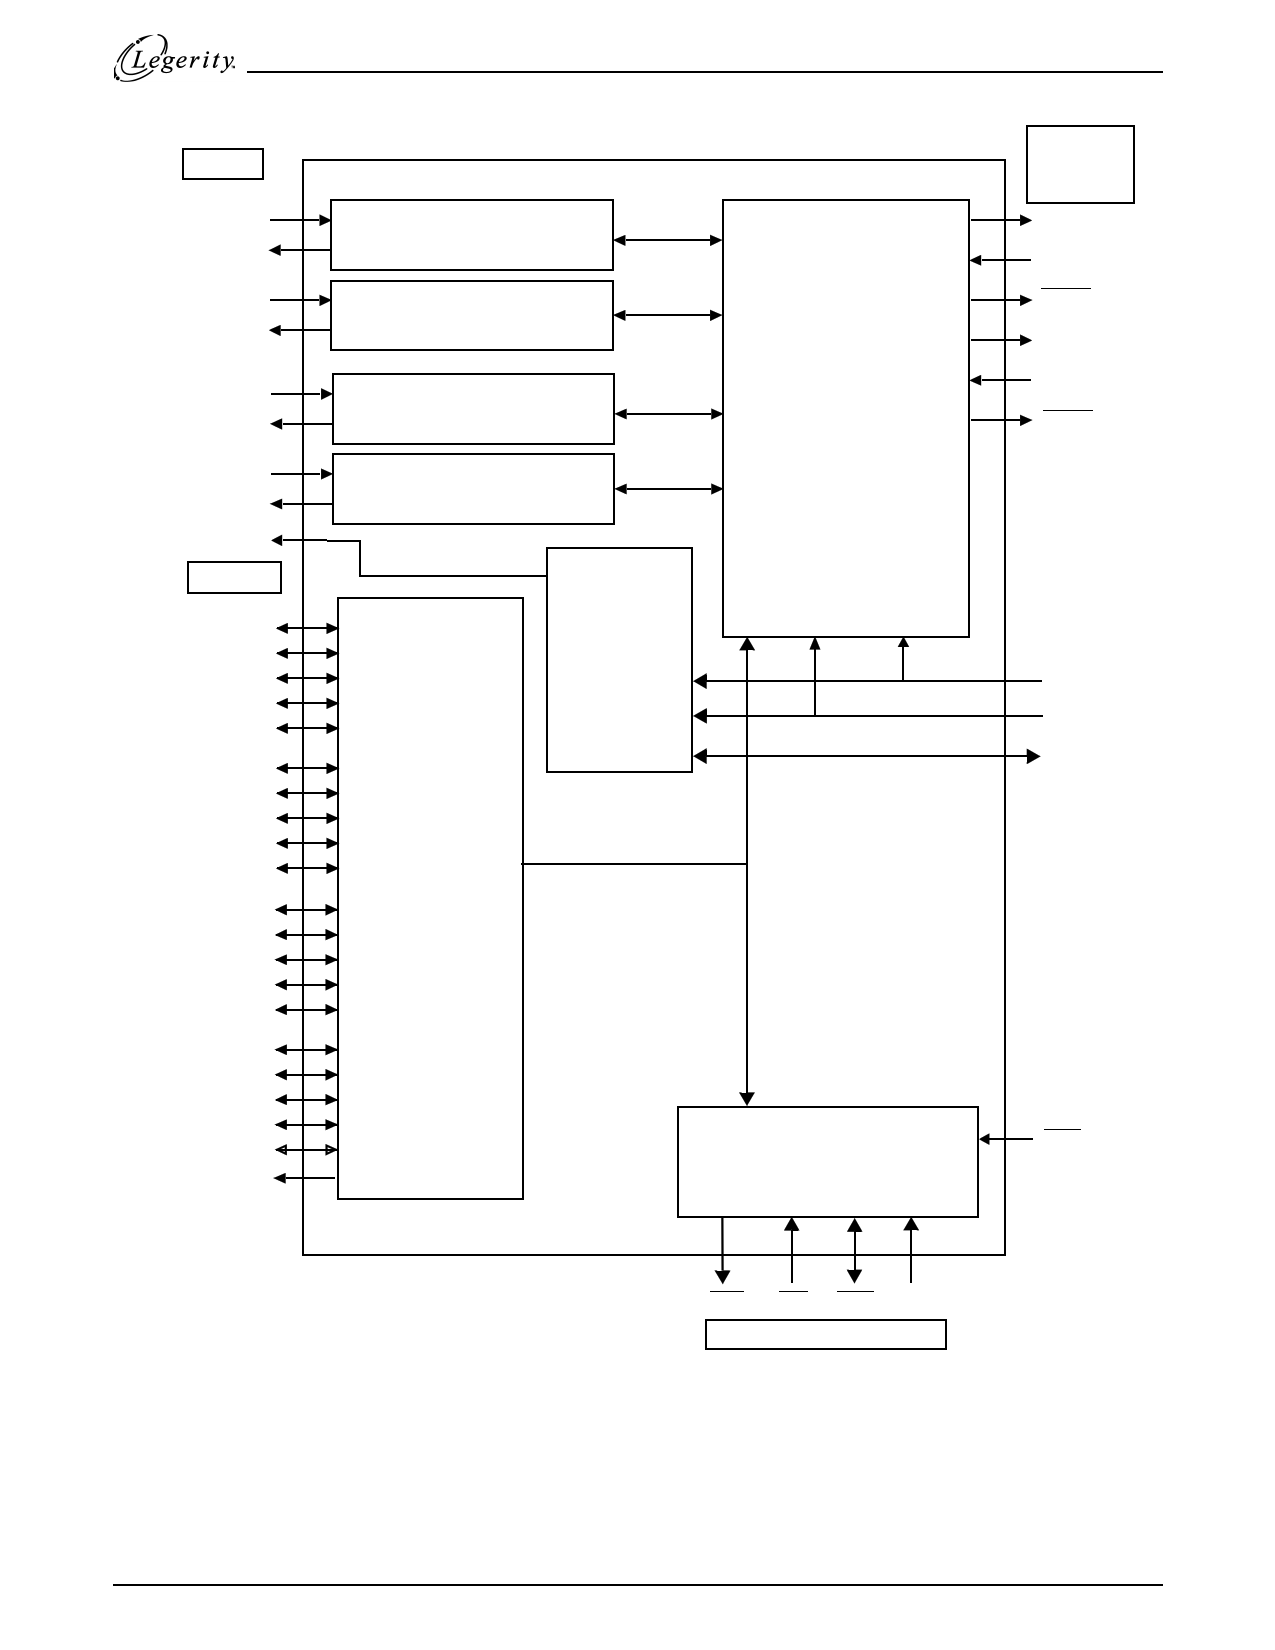 Am79Q02 pdf, 전자부품, 반도체, 판매, 대치품